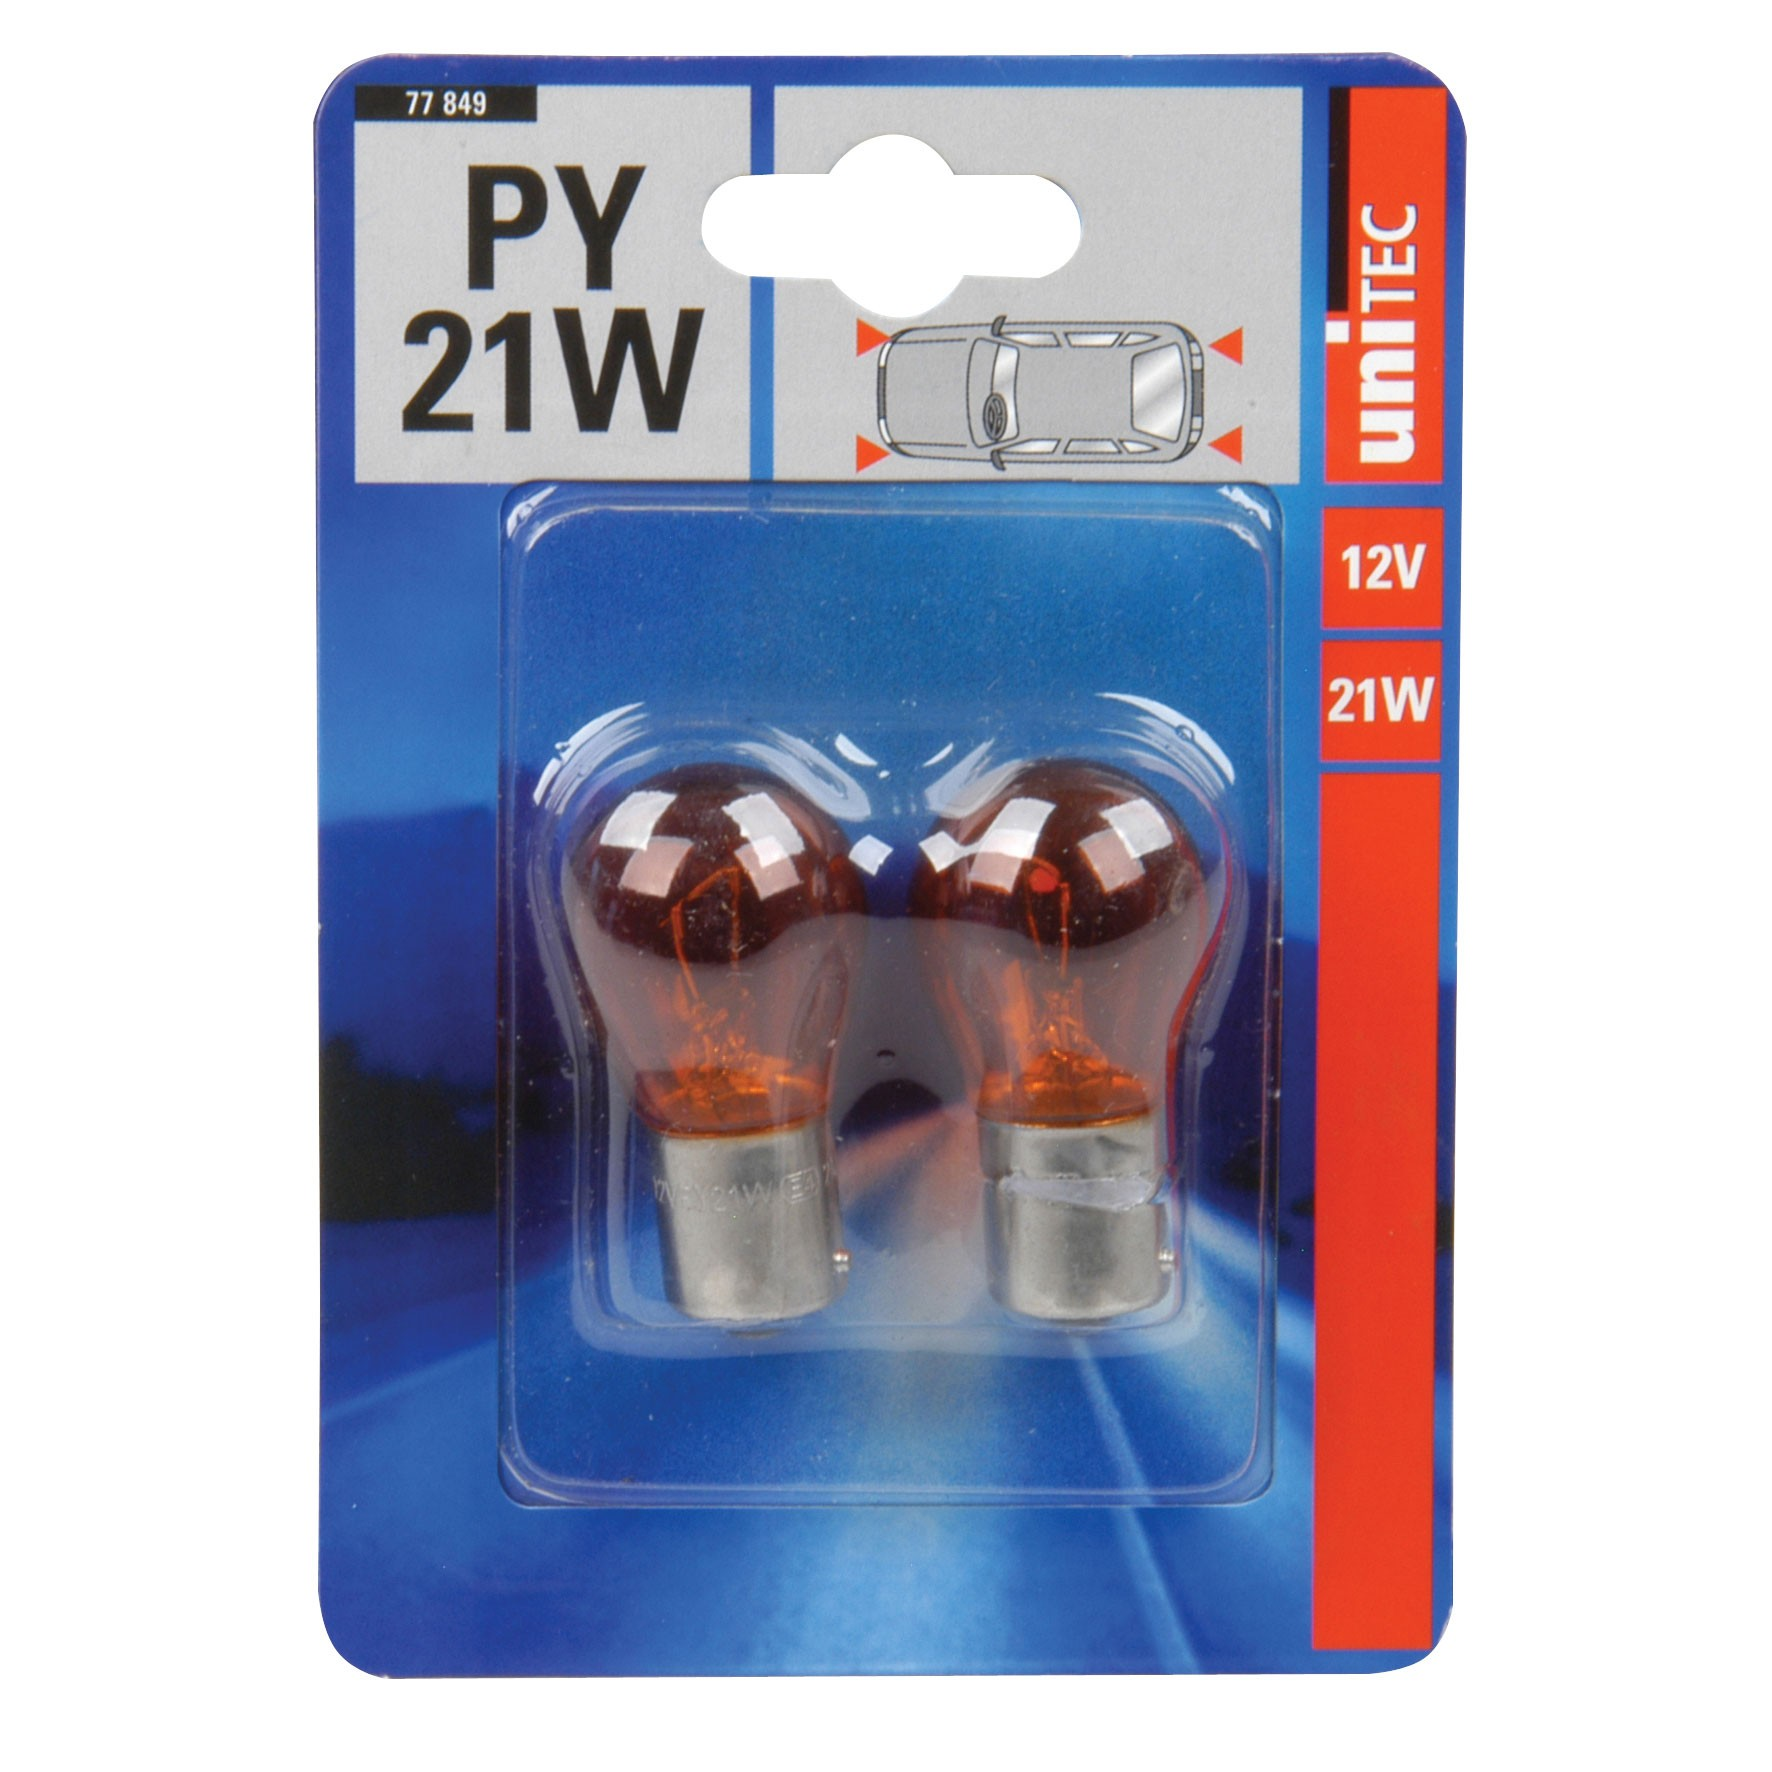 Kugellampe Unitec PY21W gelb 12Volt 2 Stück Bild 1